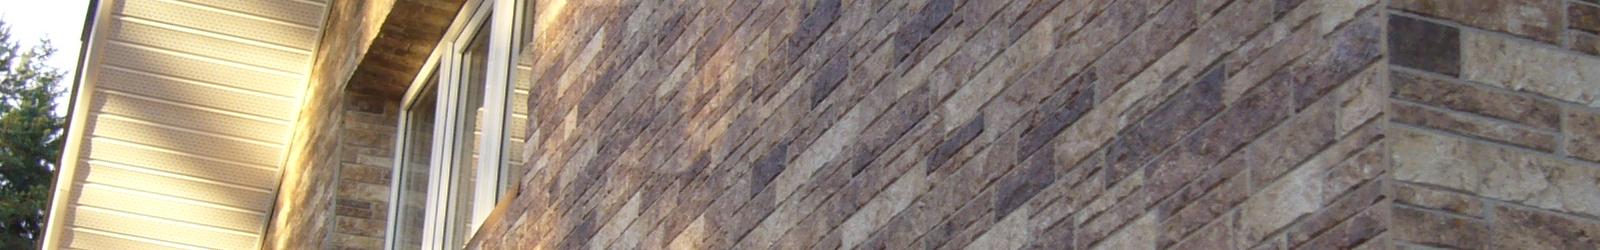 fasadnye-paneli-dikii-kamen